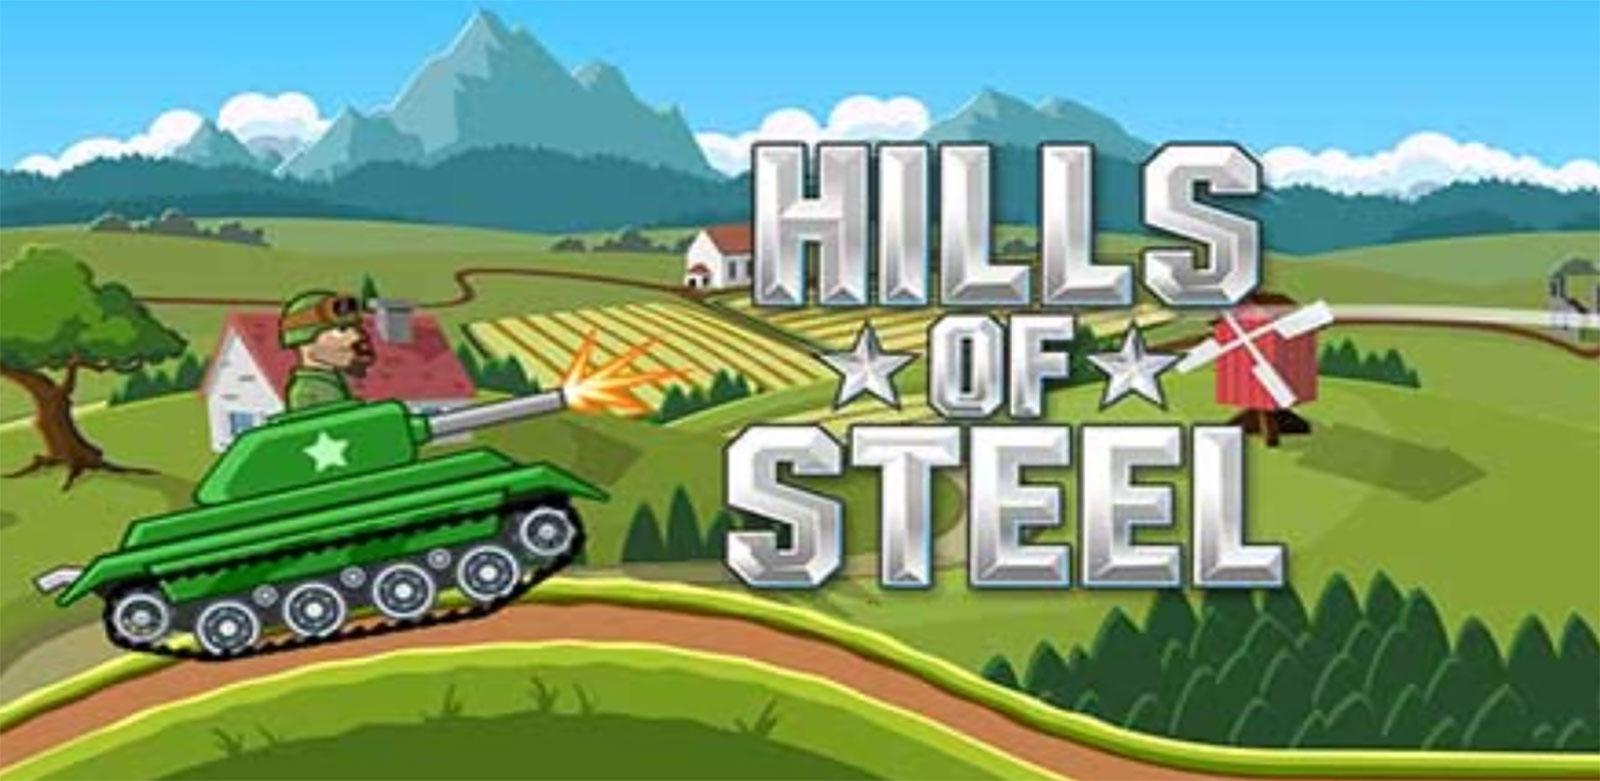 Hills of Steel Mod Apk